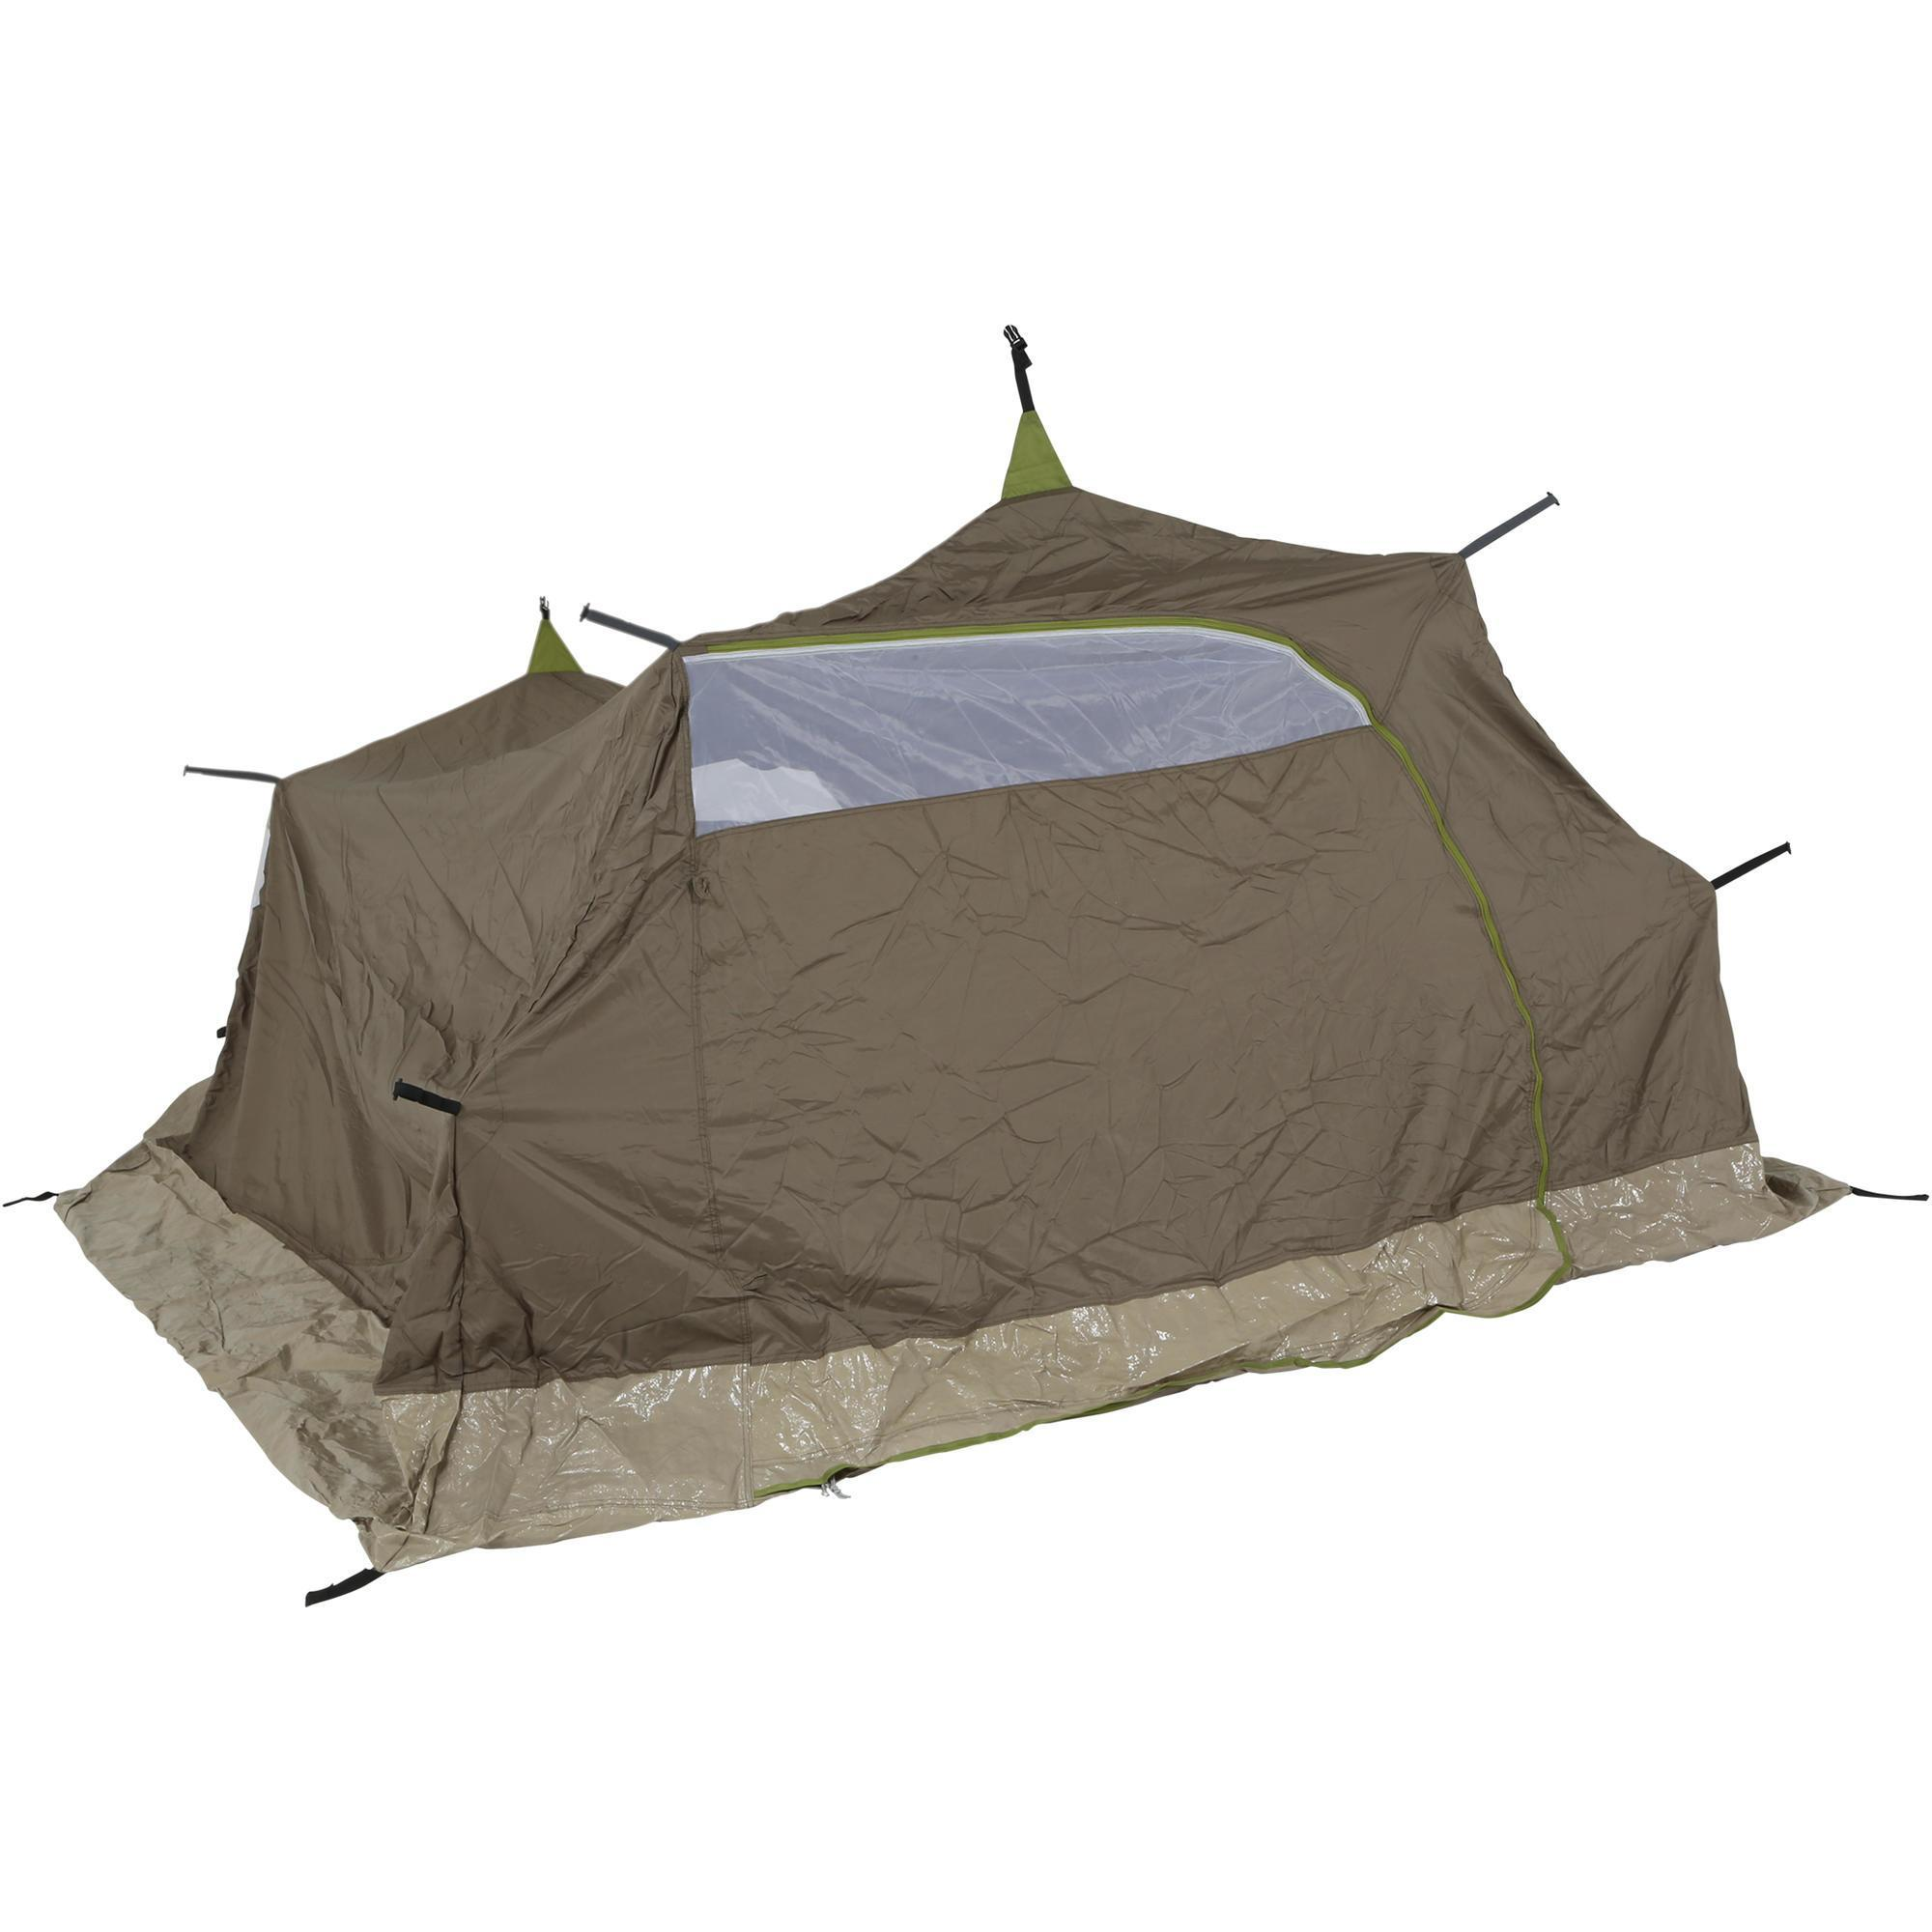 kabine zelt t4 family quechua decathlon. Black Bedroom Furniture Sets. Home Design Ideas